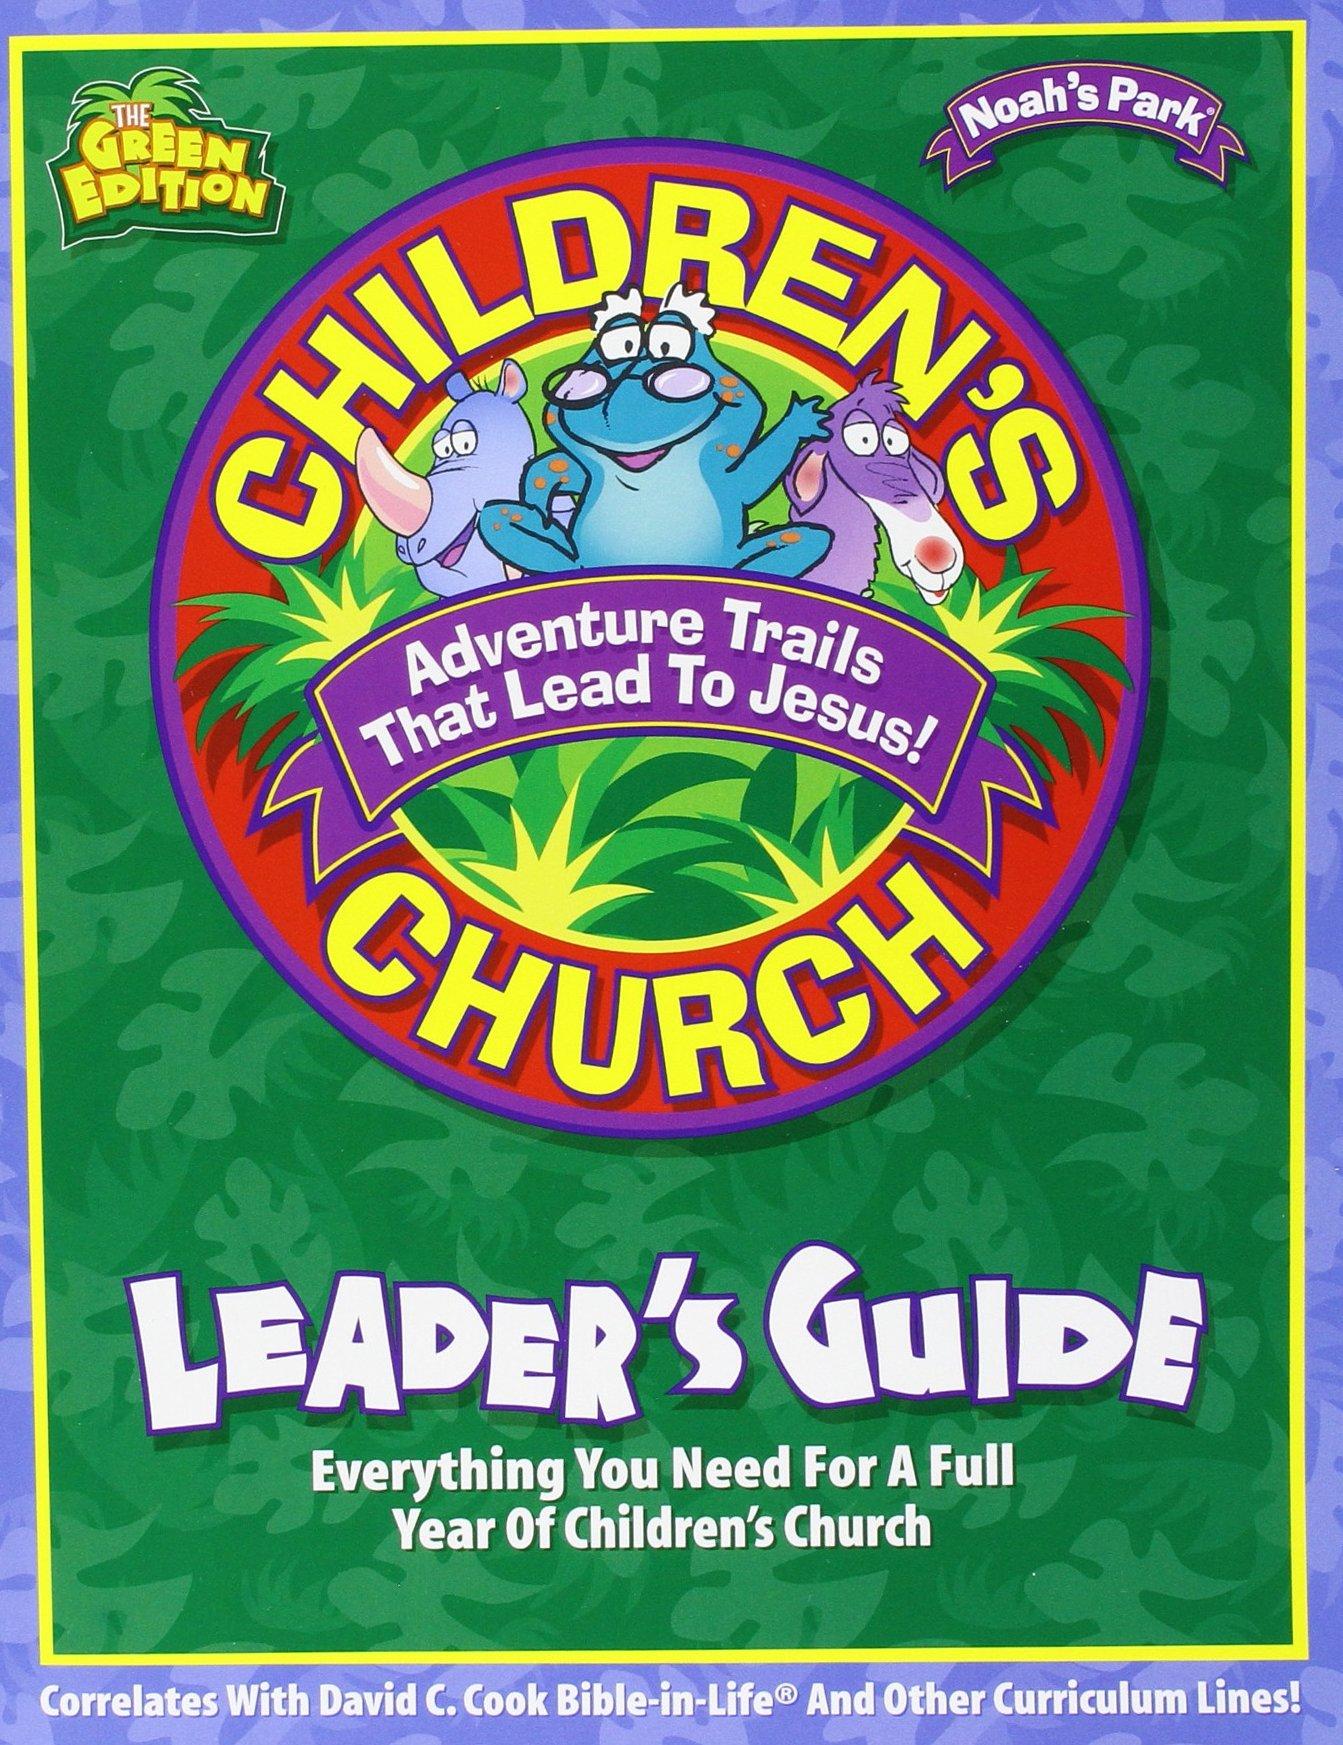 Download Noah's Park Children's Church Kit - Green Edition (Adventure Trails That Lead to Jesus! Noah's Park Children's) pdf epub